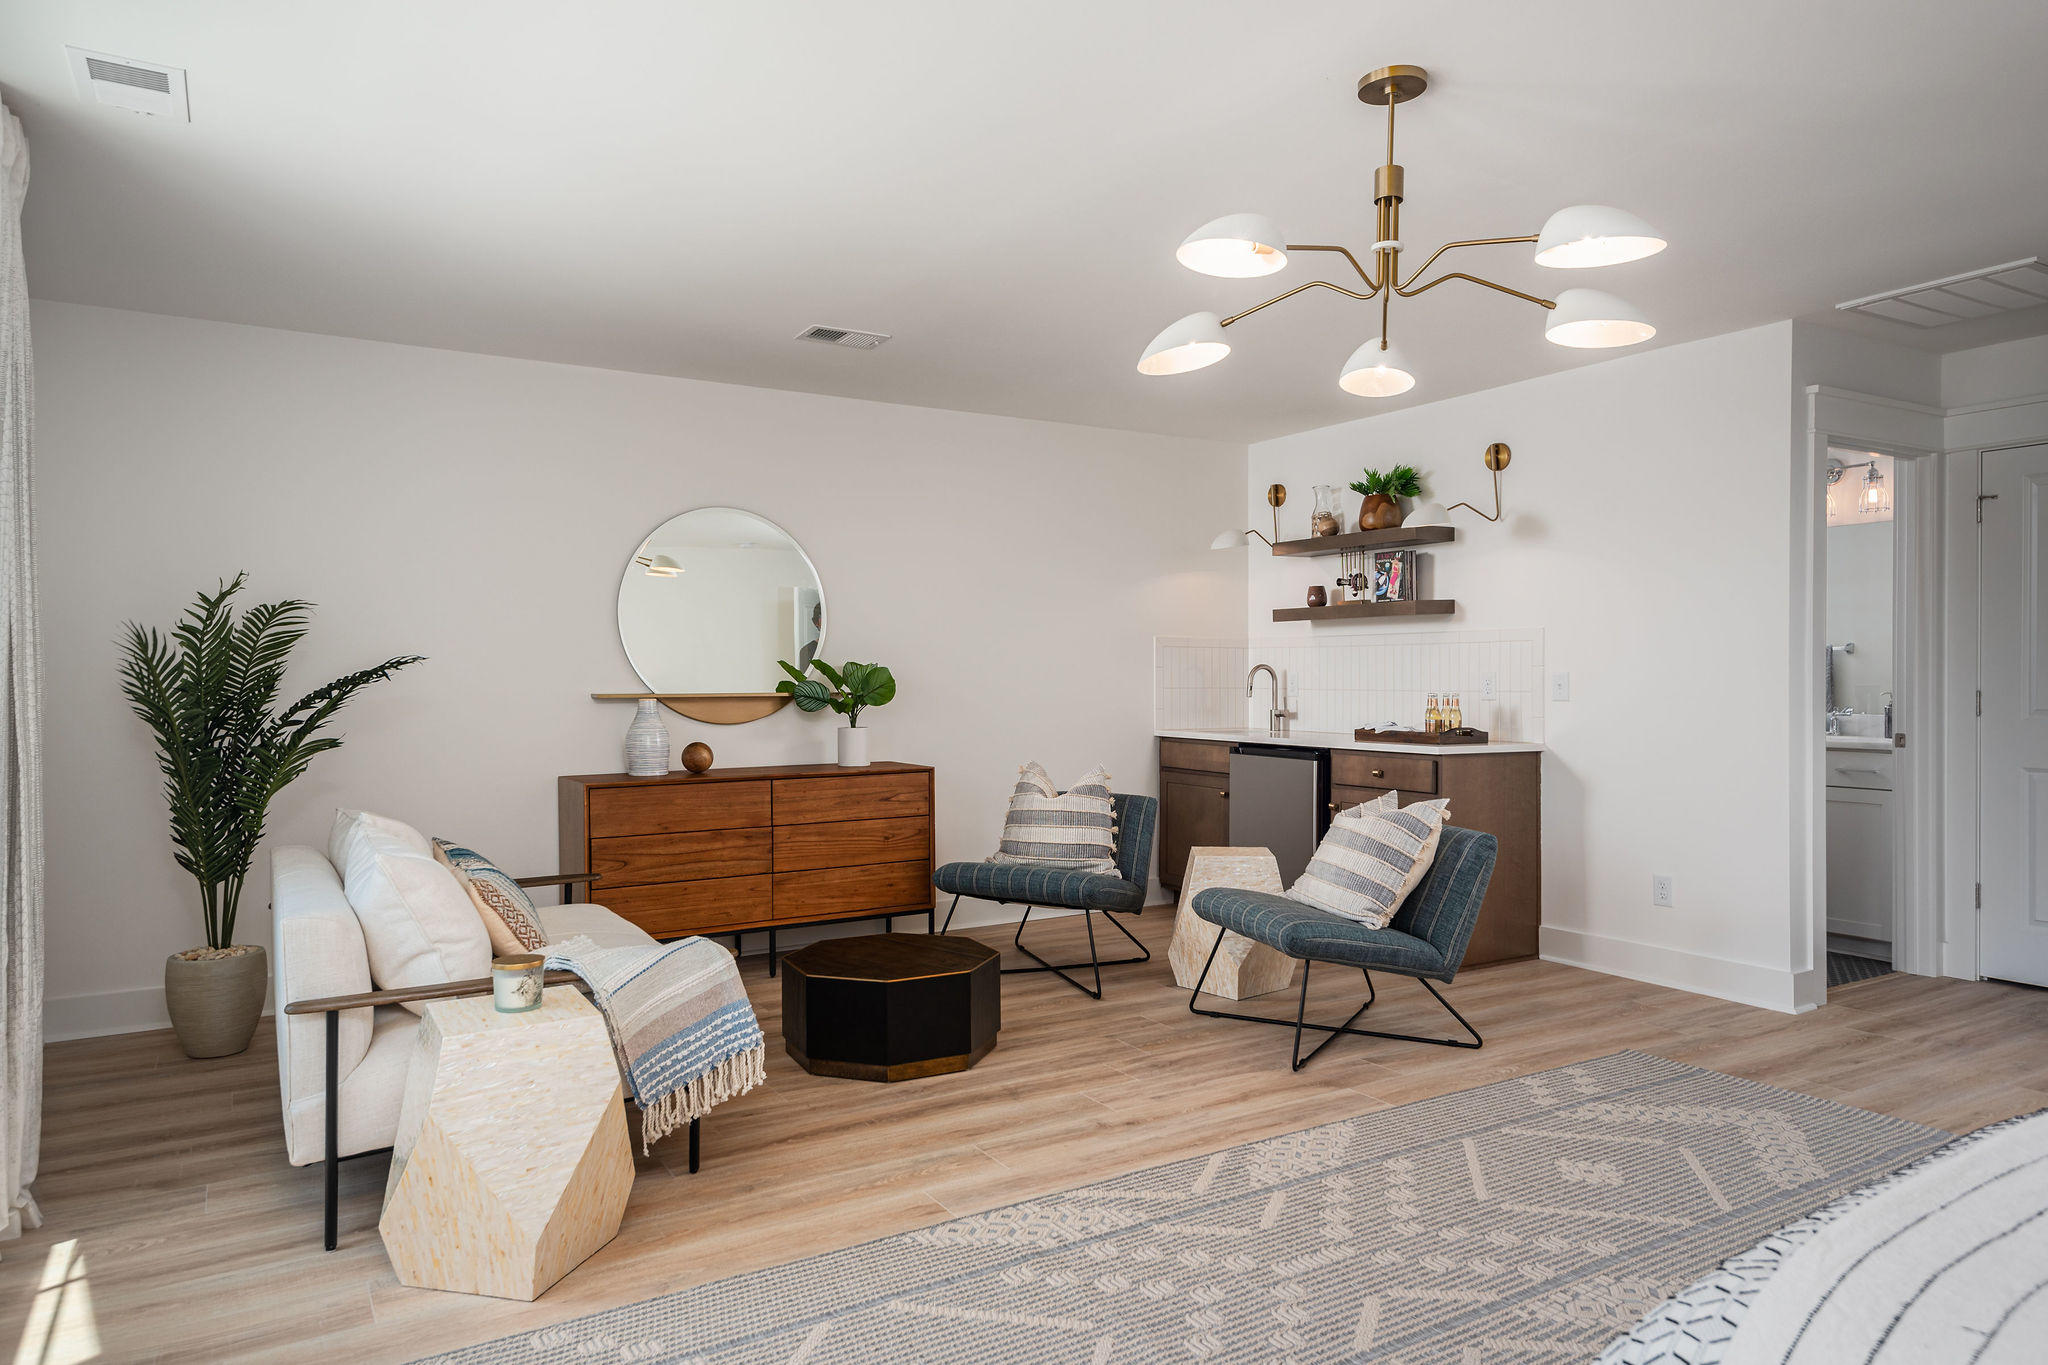 Midtown Homes For Sale - 1344 Upper Union, Mount Pleasant, SC - 36